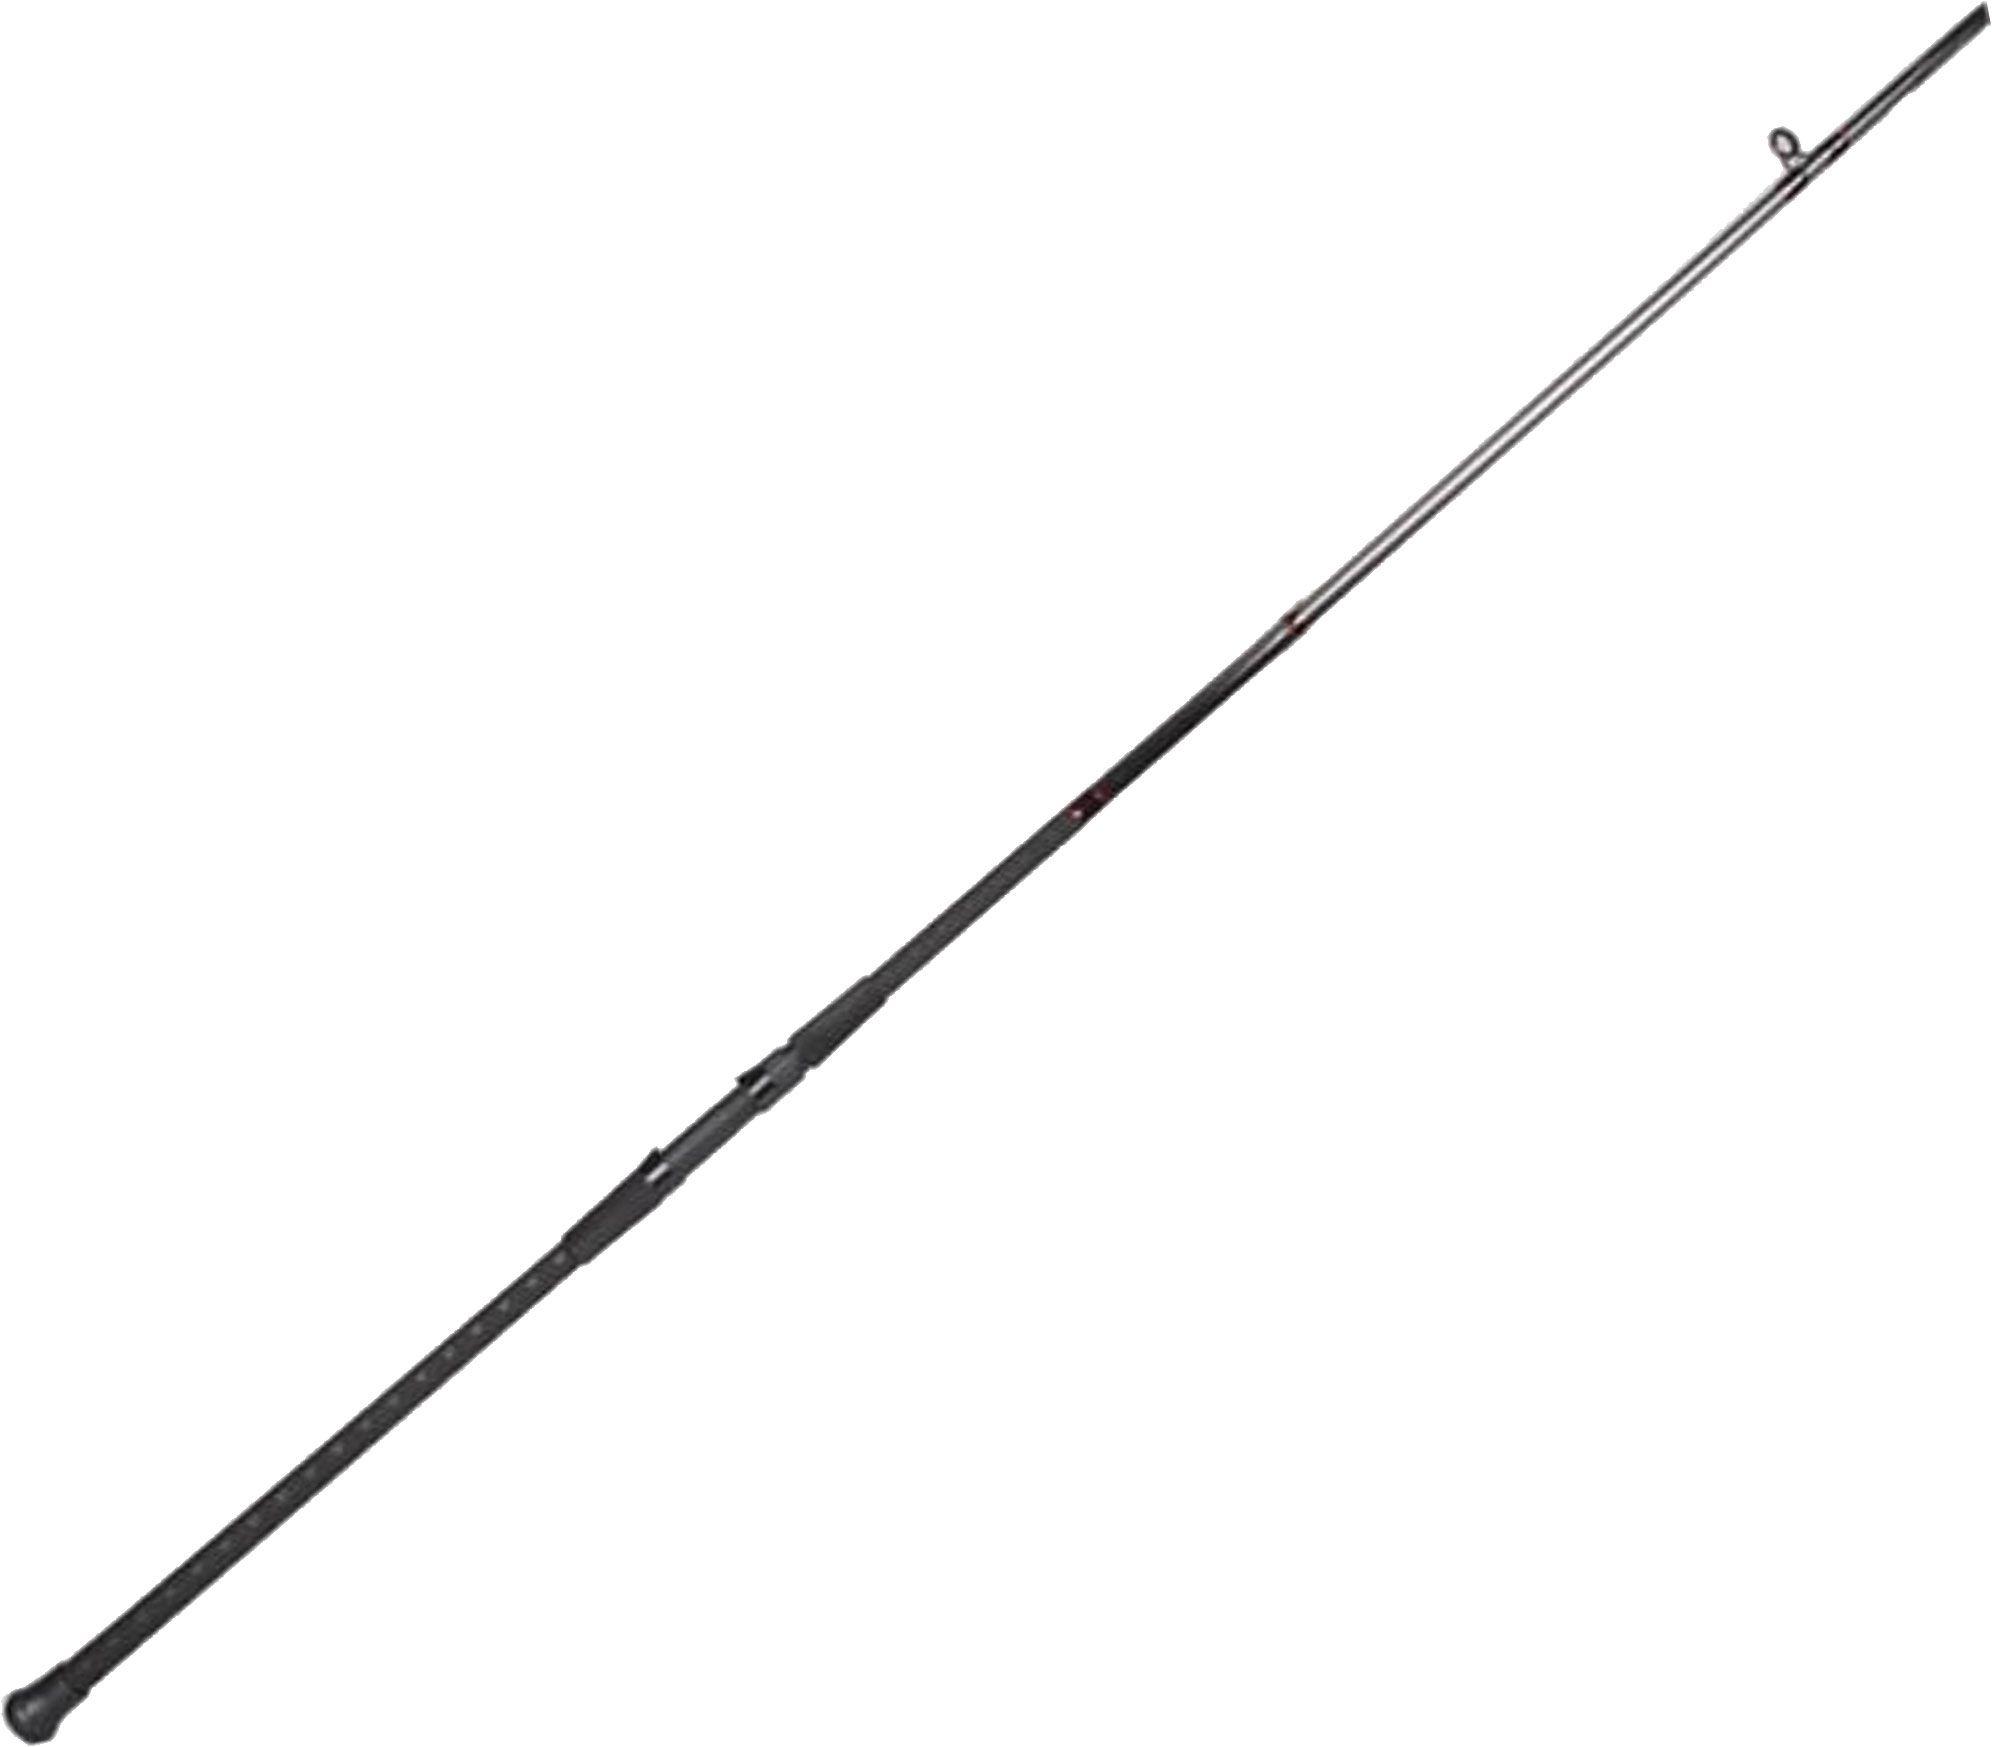 Lamiglas Insane Surf Spinning Rod, Size: Medium